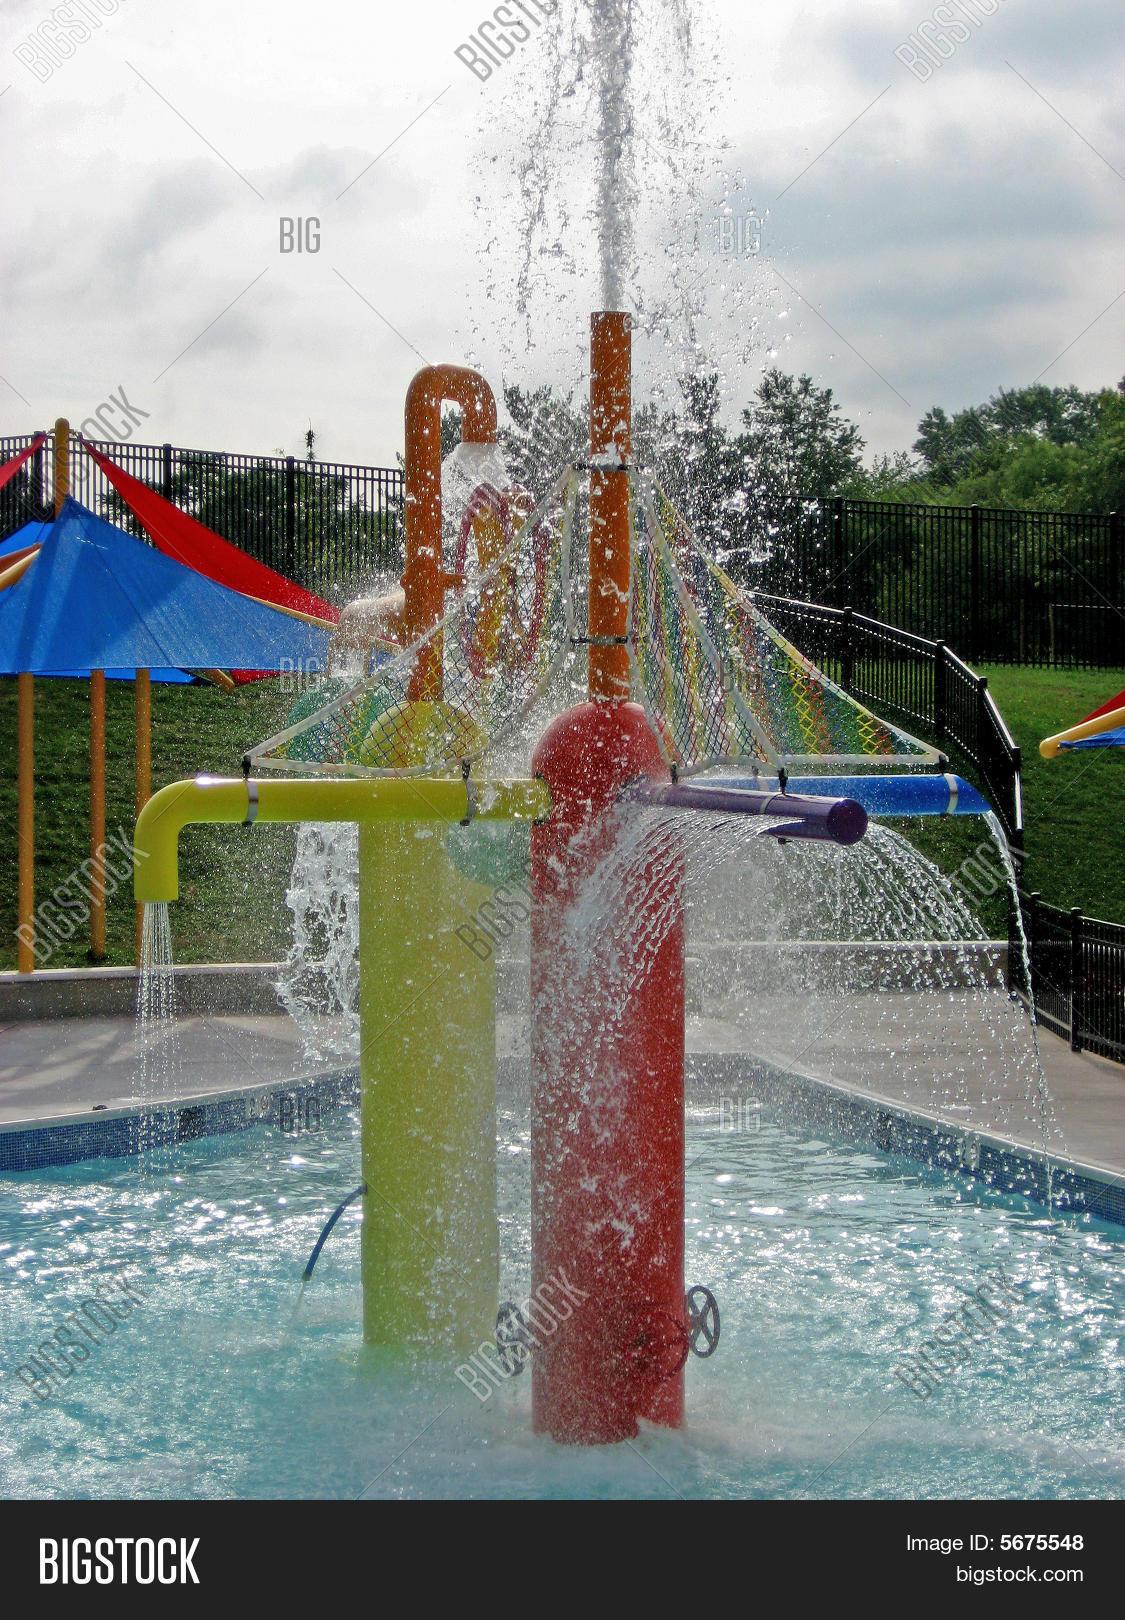 swimming pool sprinkler fun image photo bigstock